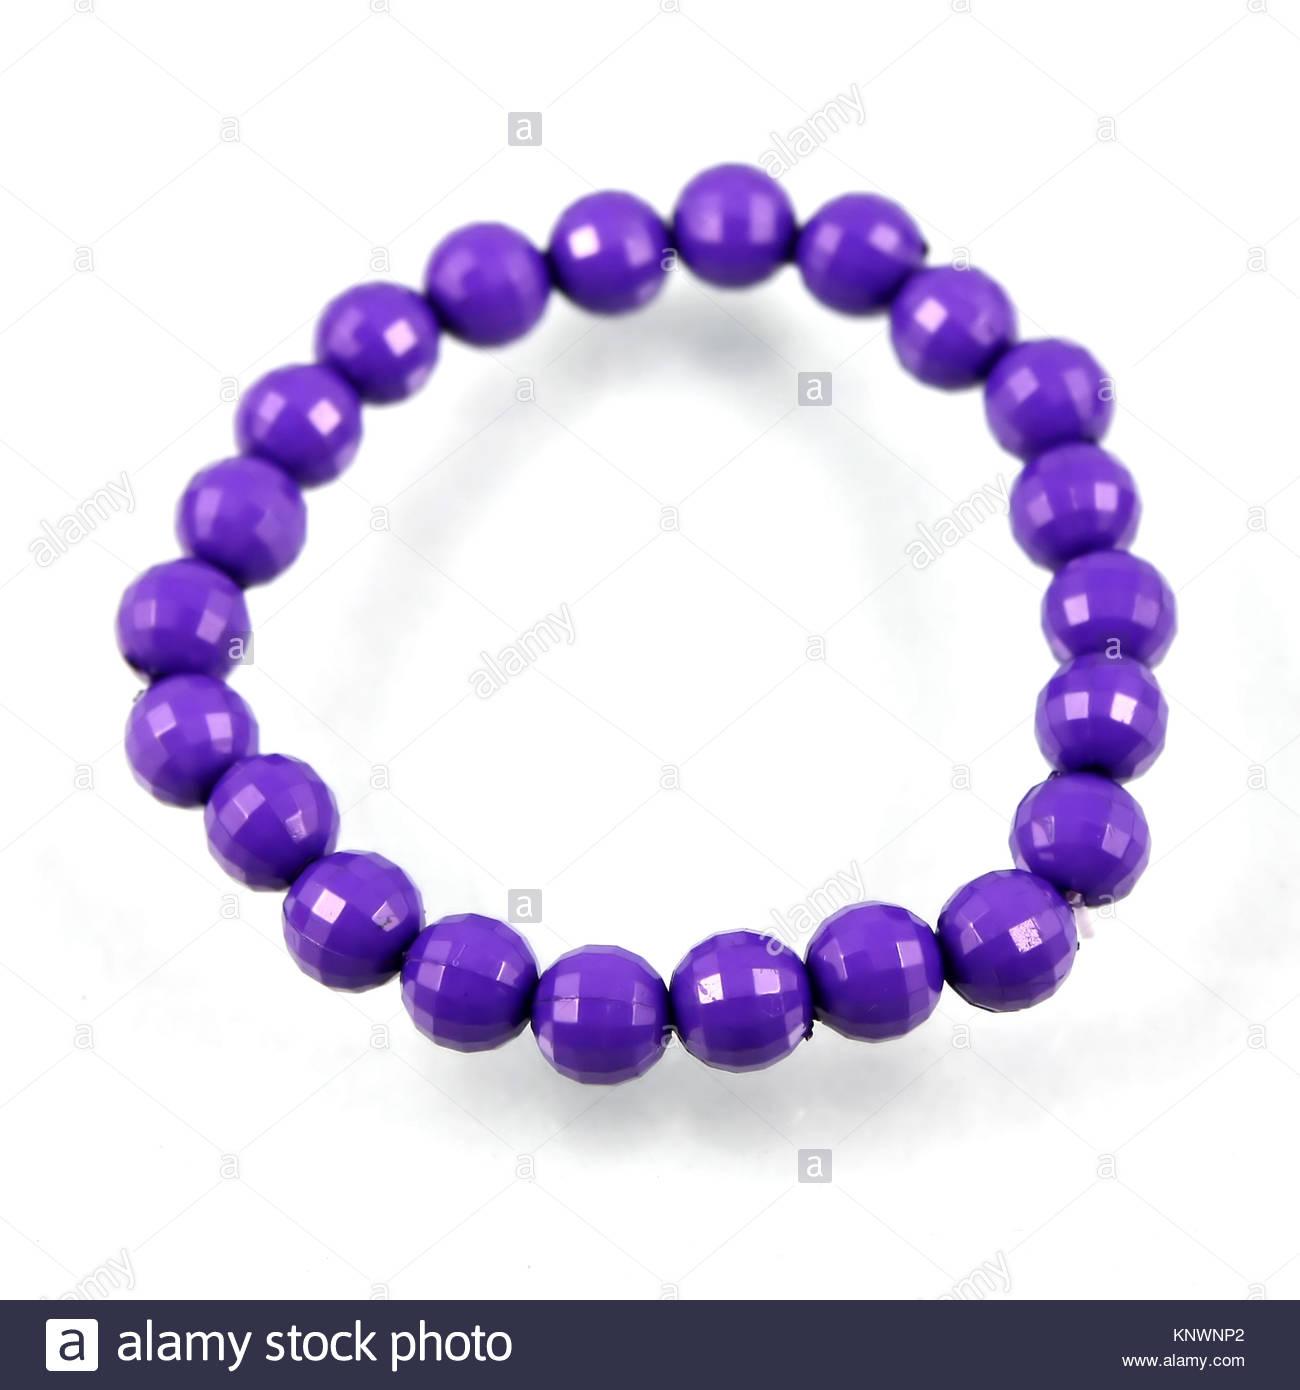 Nara Beads: Bead Bracelets Stock Photos & Bead Bracelets Stock Images